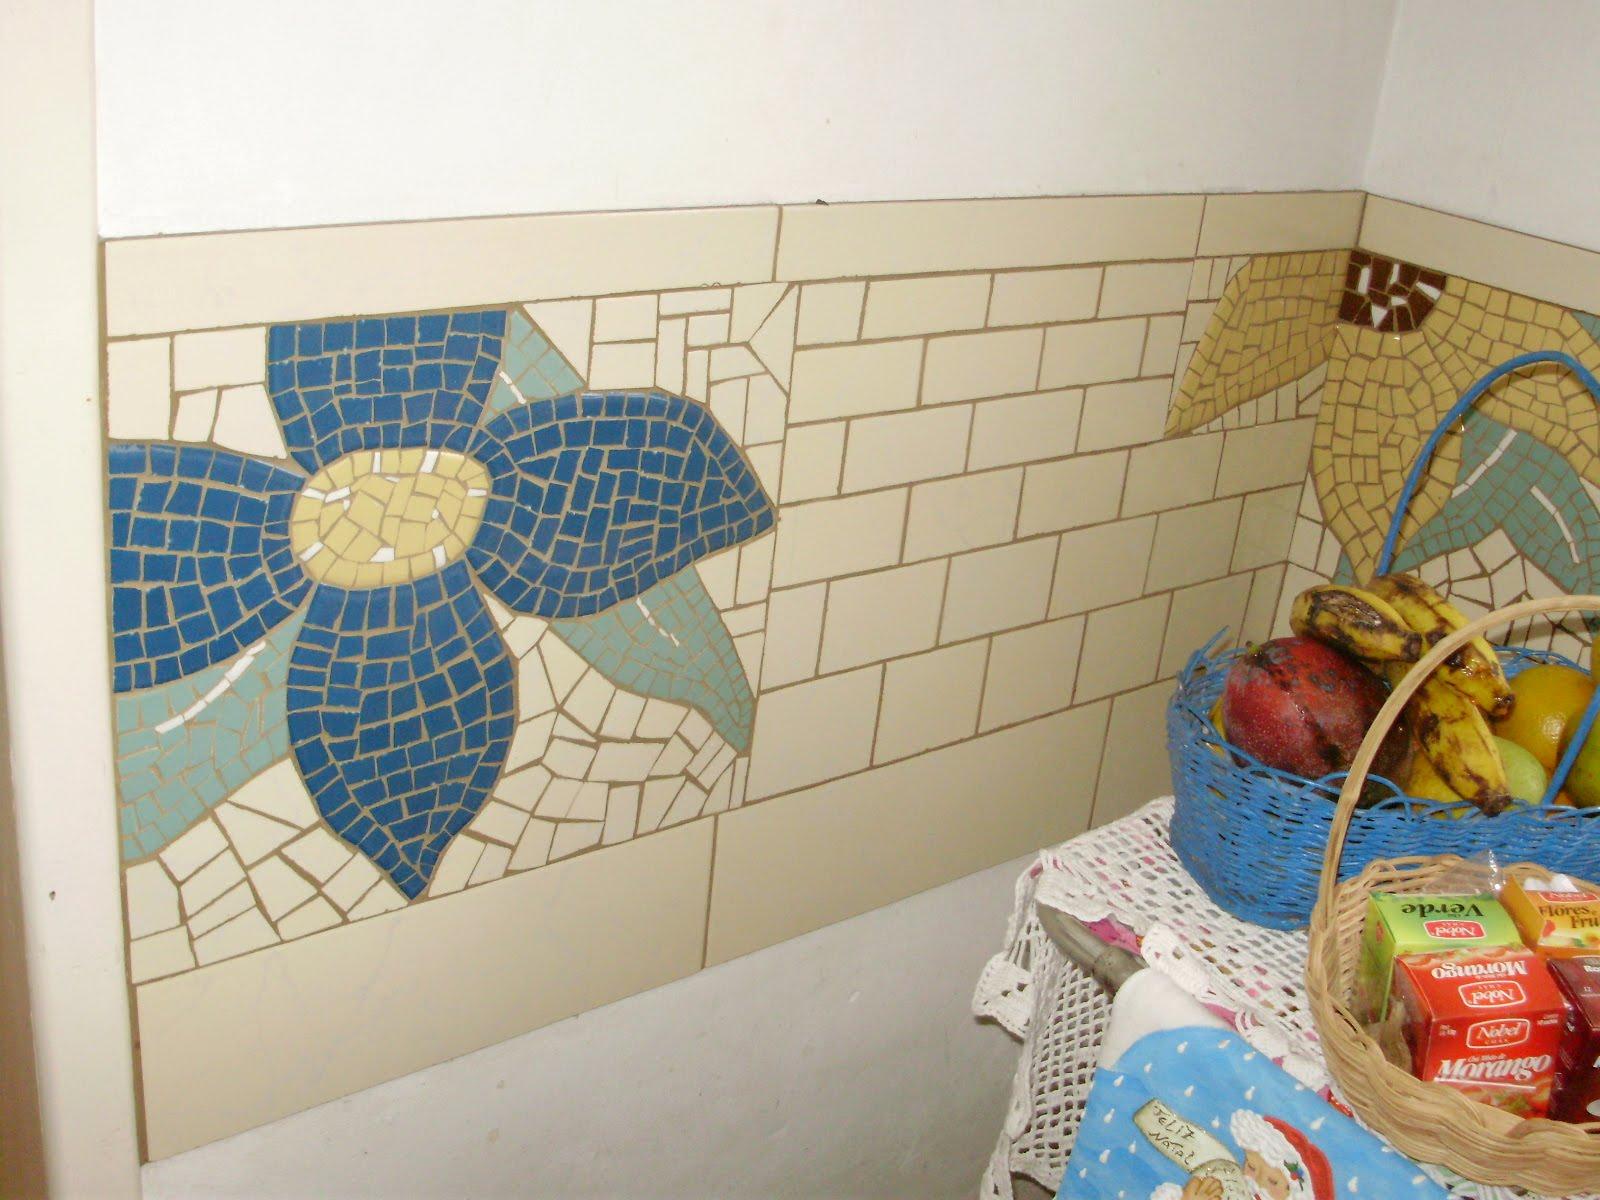 Mosaico arte constru o pano de parede para canto de for Mosaicos para paredes interiores